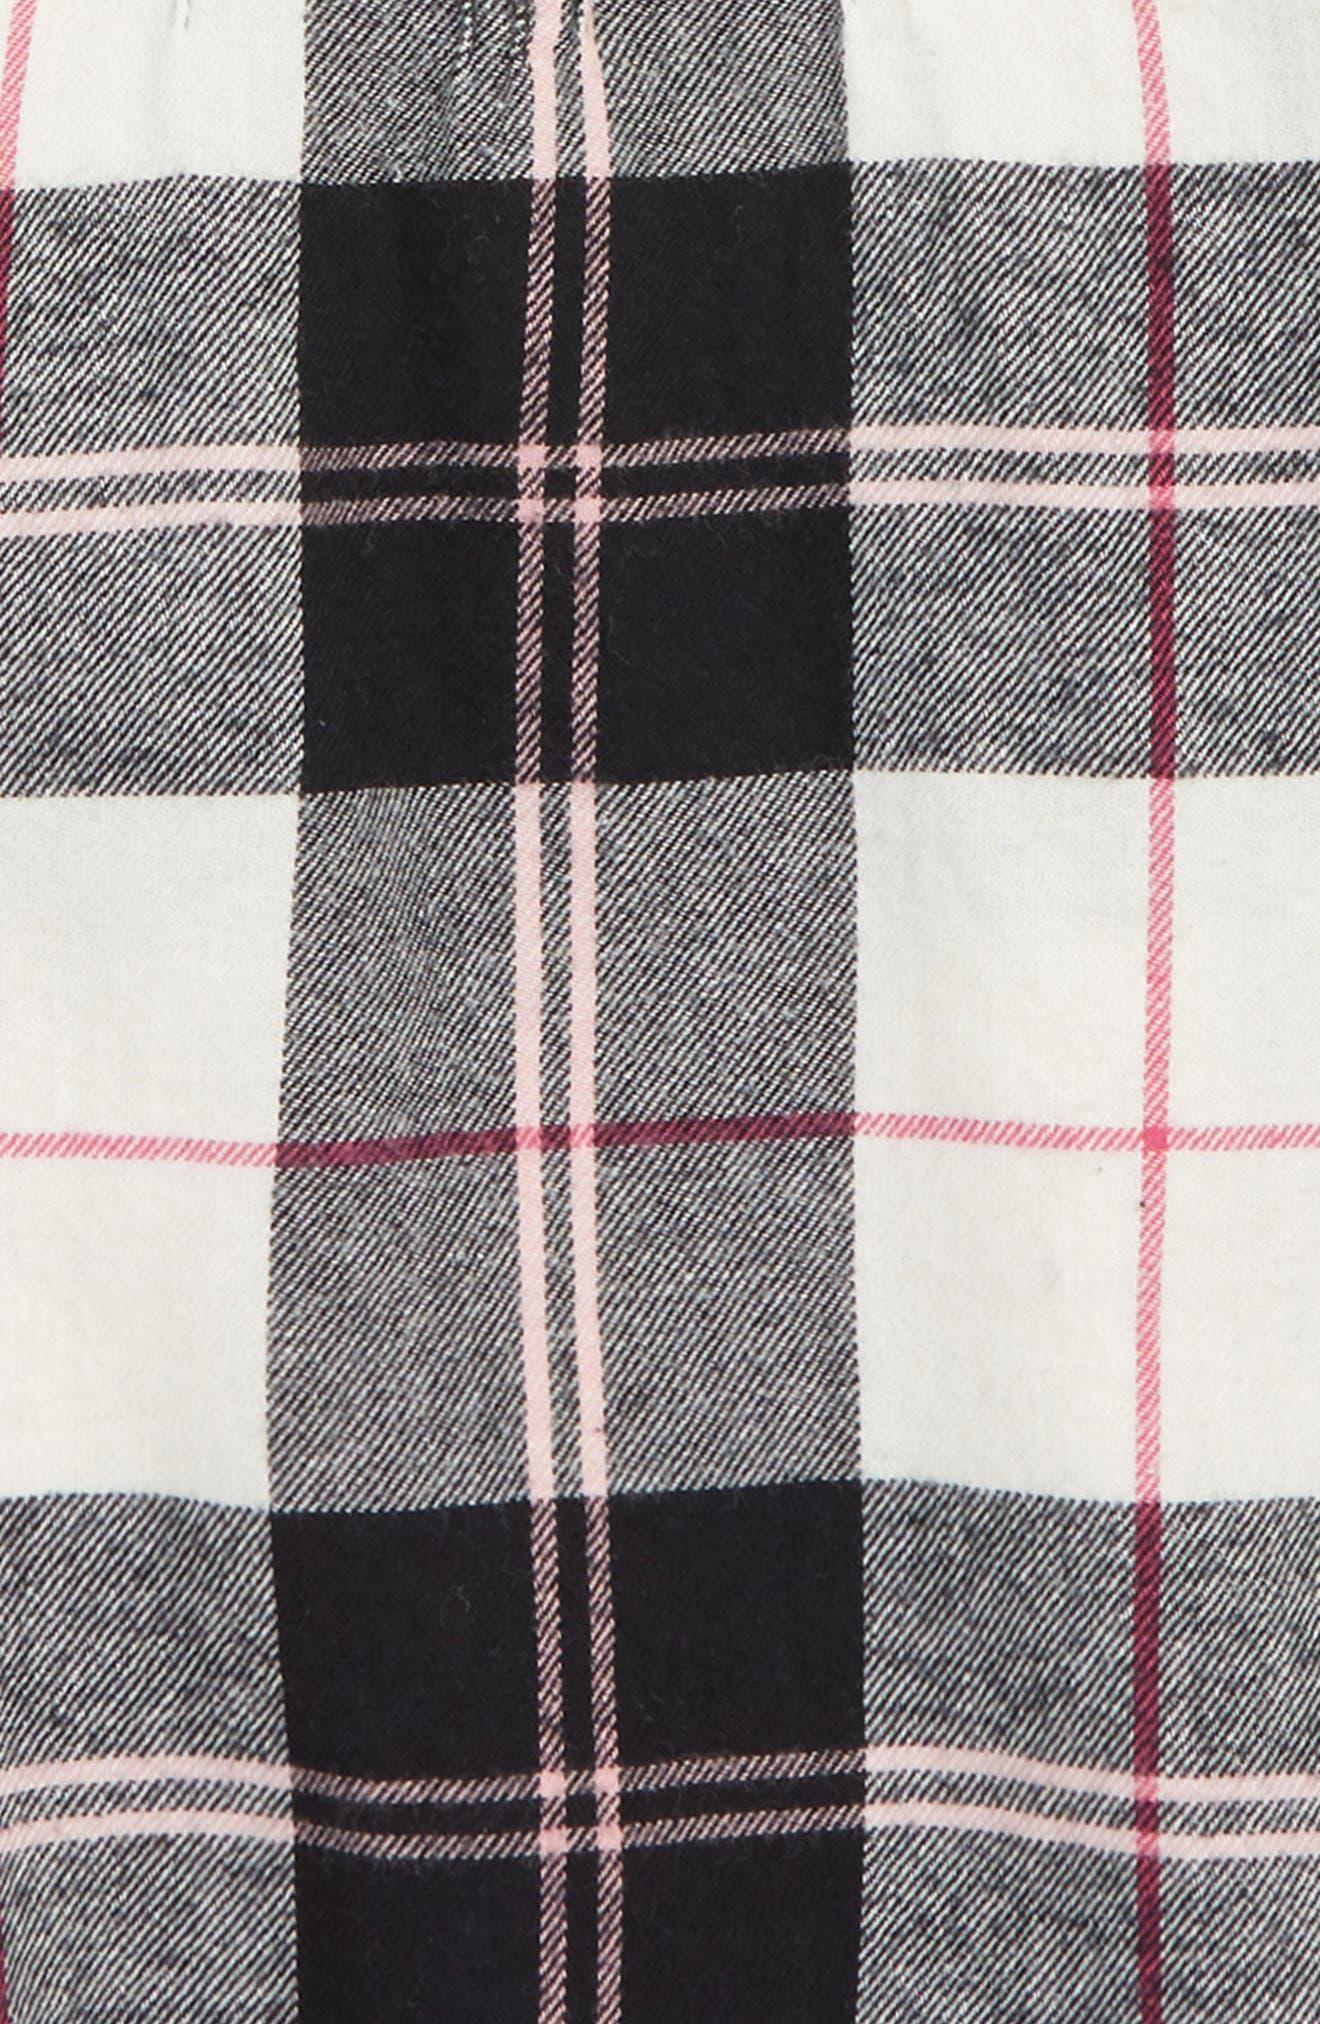 Flannel Dress,                             Alternate thumbnail 3, color,                             BLACK- IVORY WINDOW BUFFALO